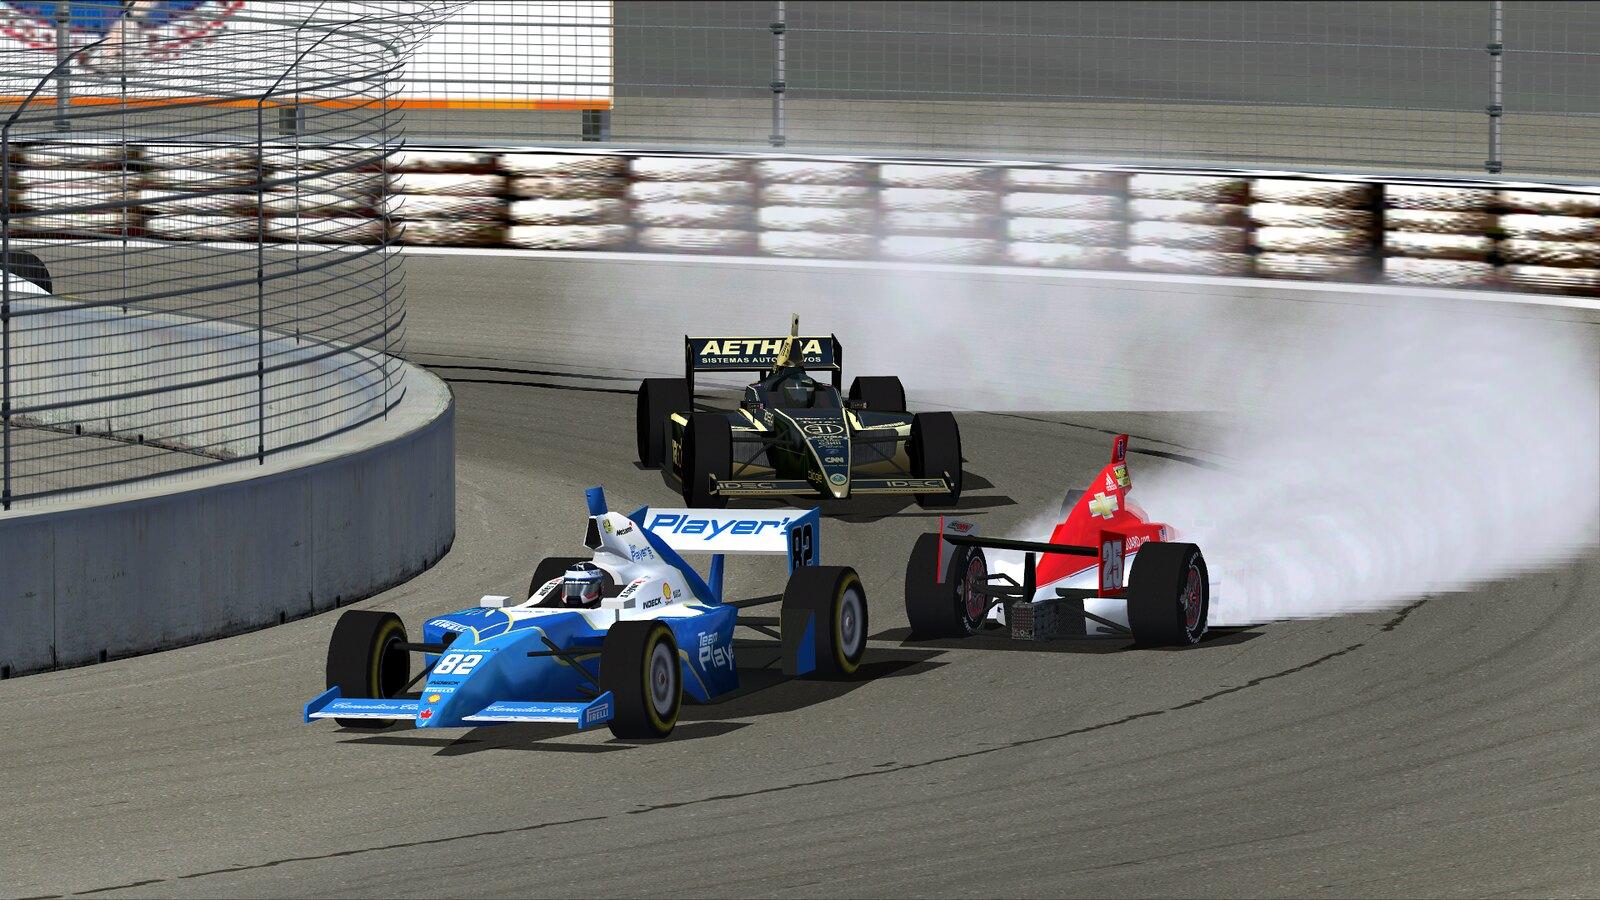 Lotus Grand Prix of Long Beach [33L] 7413263796_a0fadac5cc_h